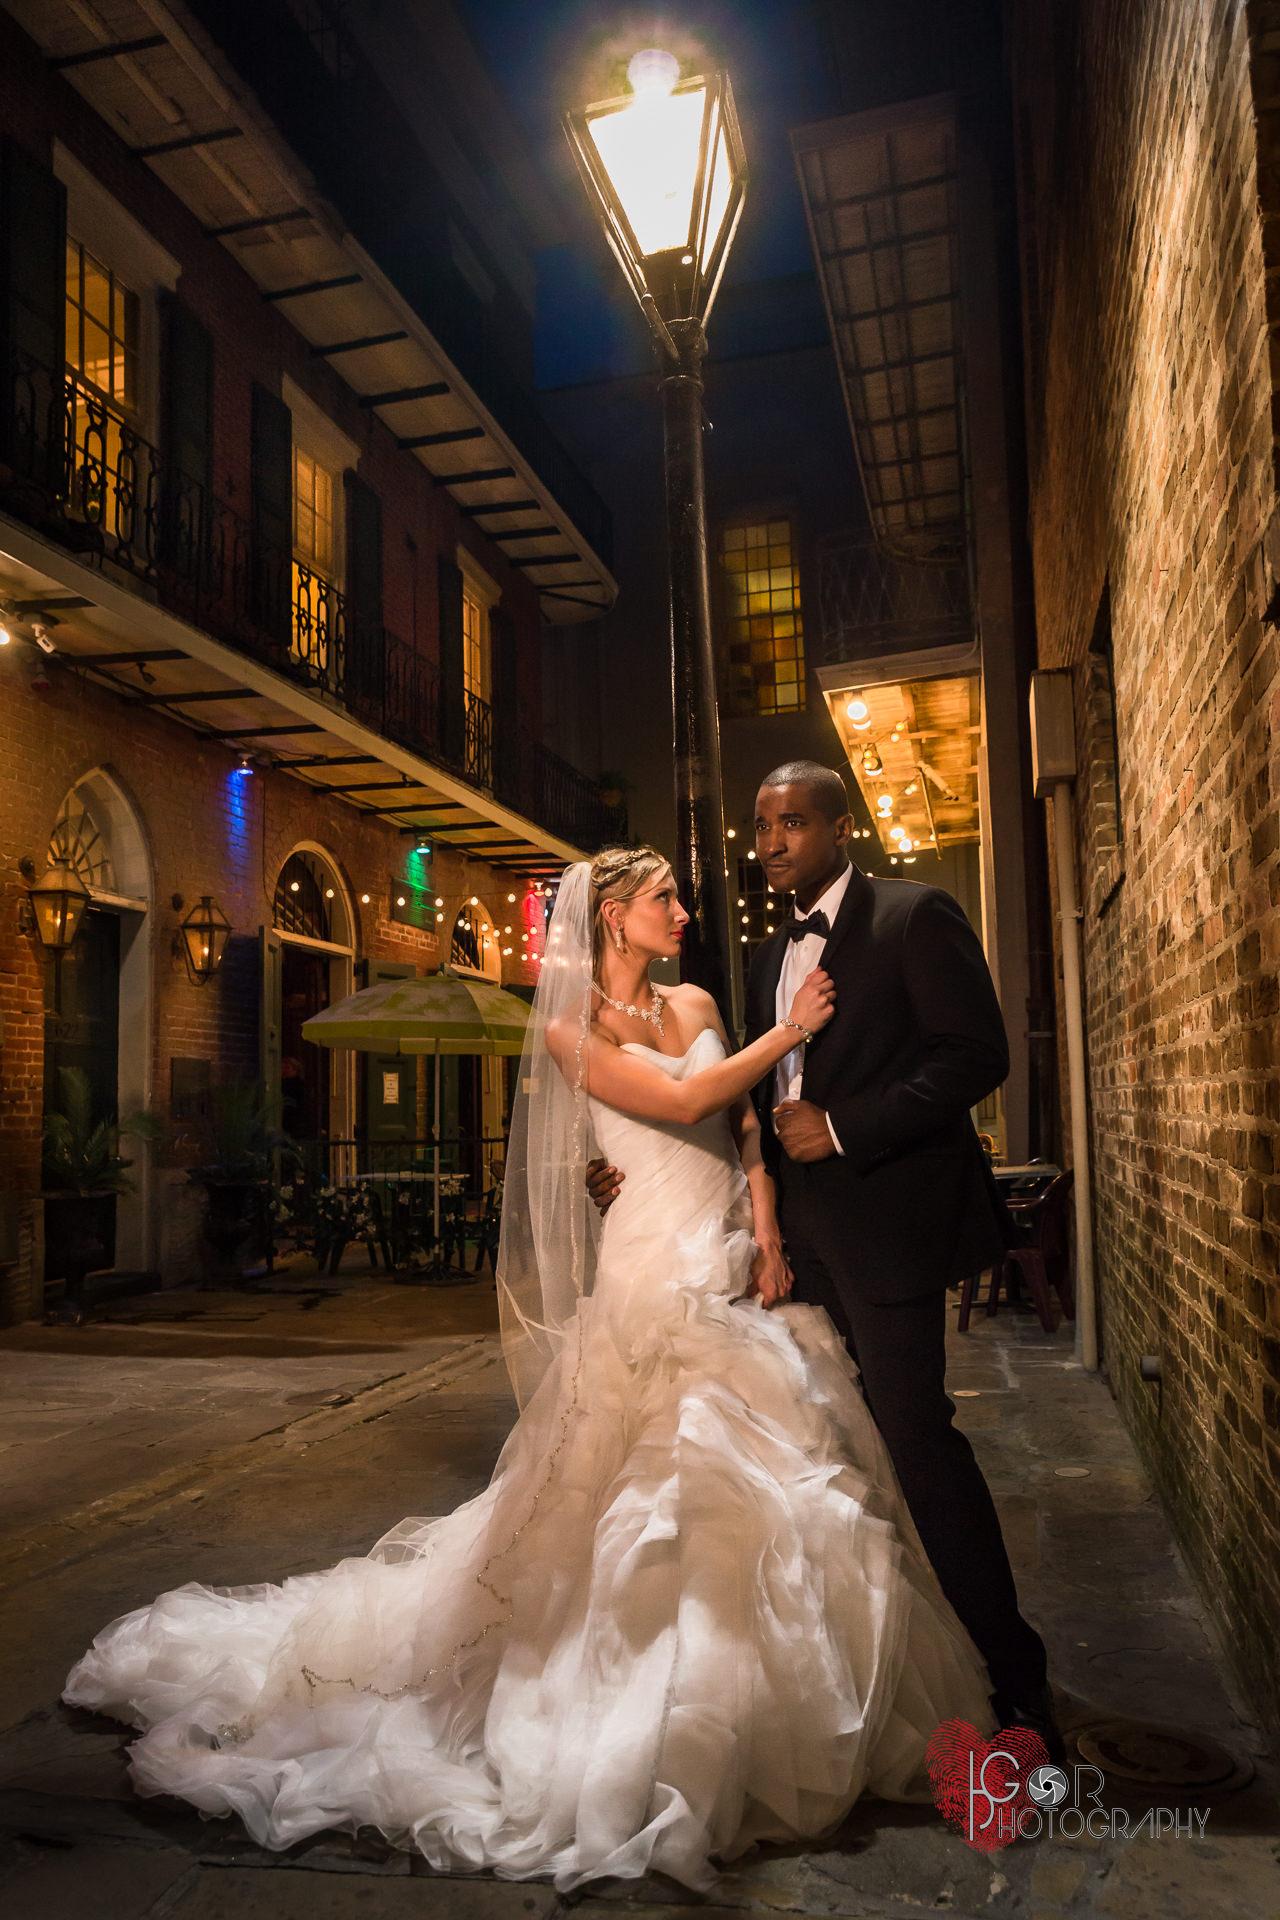 Romantic Wedding photography in Nola